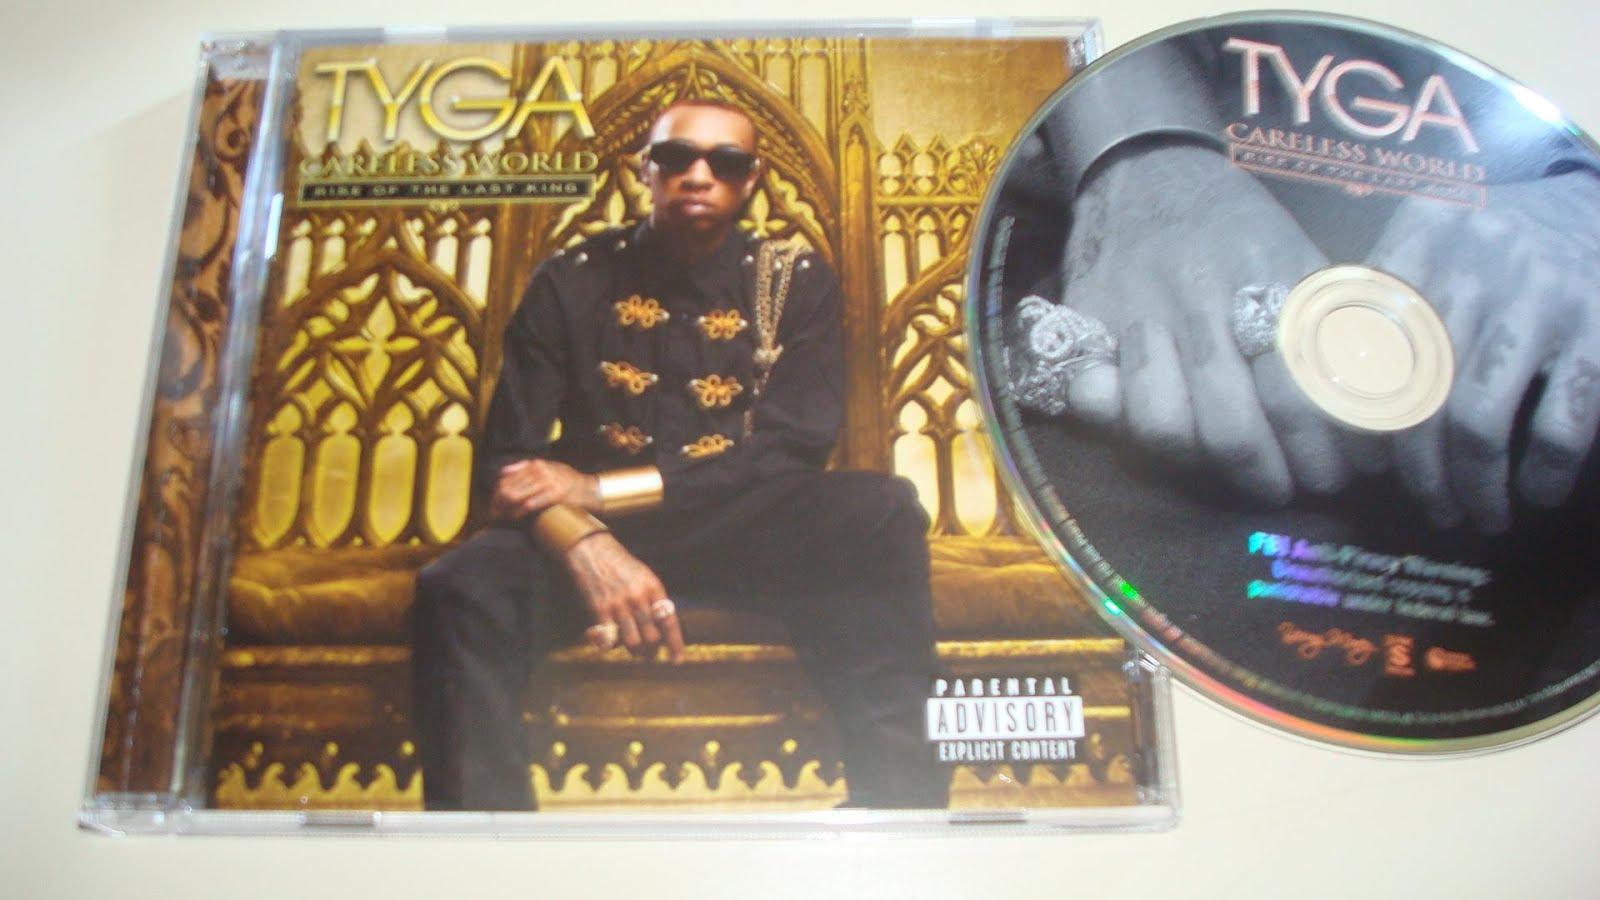 Tyga - Careless World Free Mixtape Download